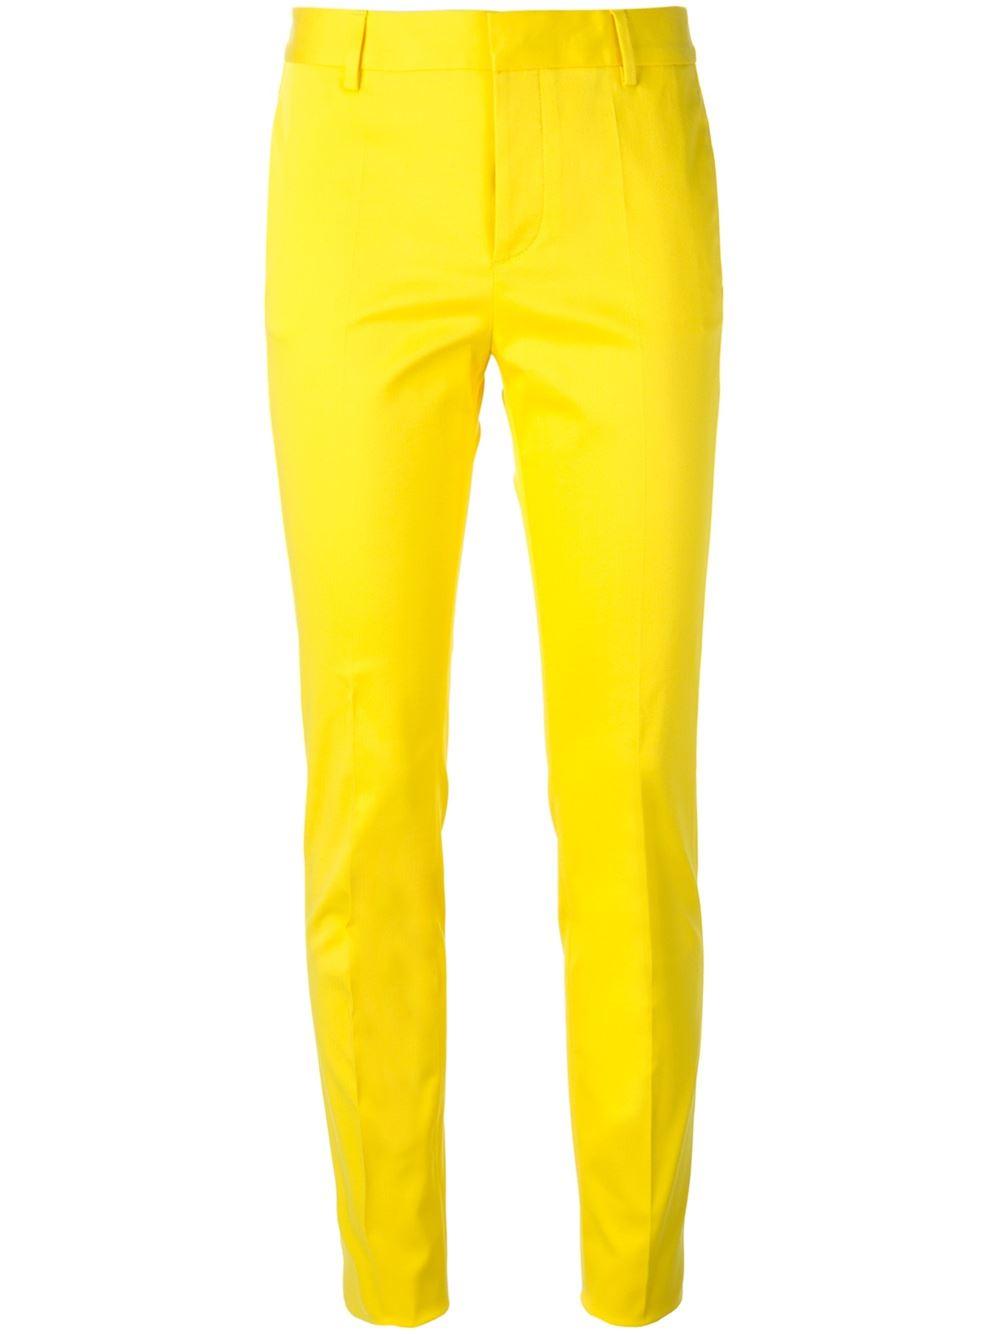 Awesome Balmain Pants  Shop For Balmain Pants On Polyvore